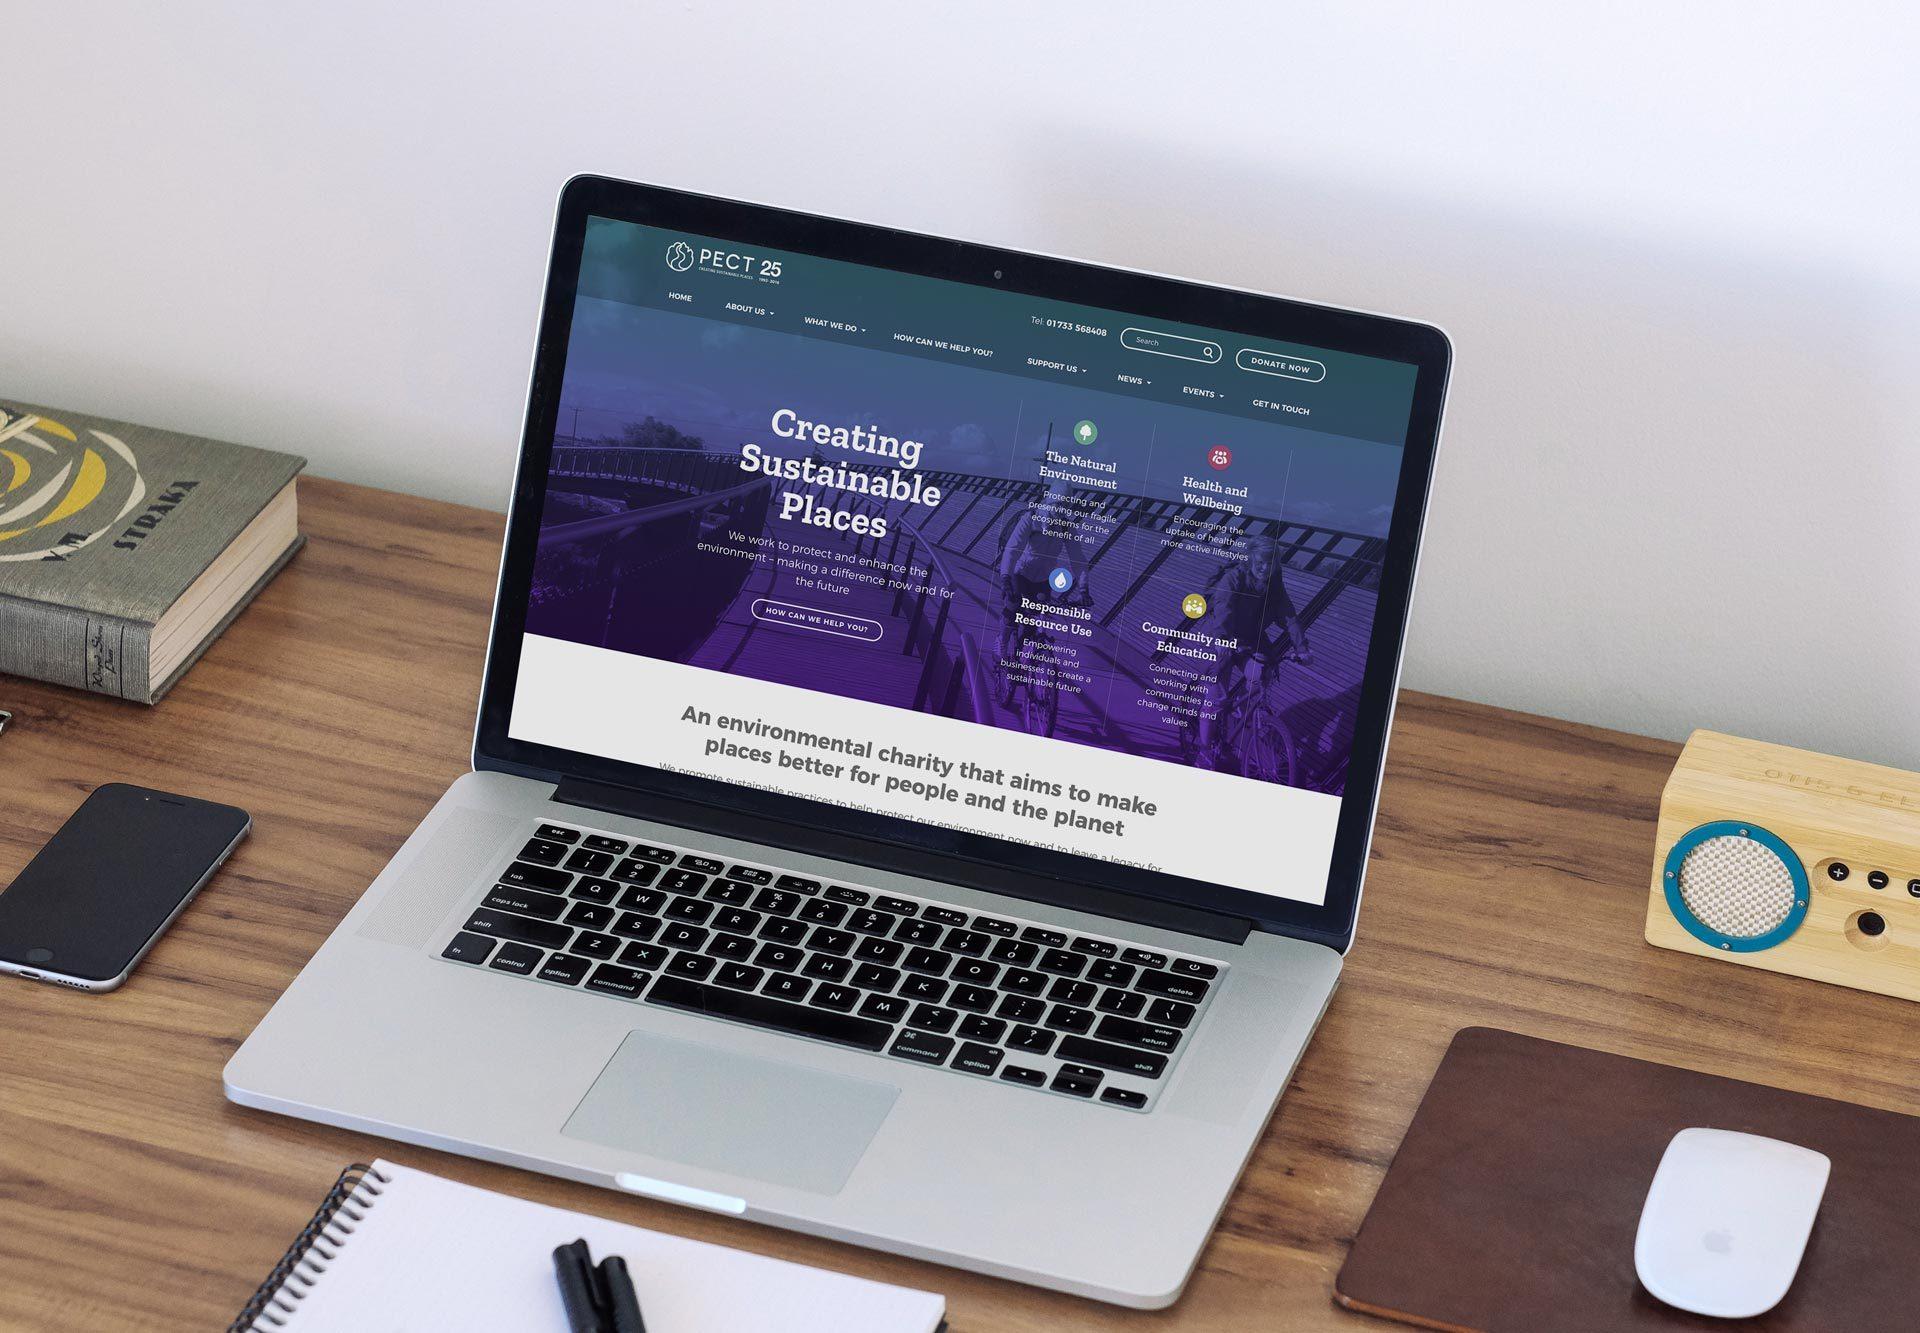 PECT Homepage